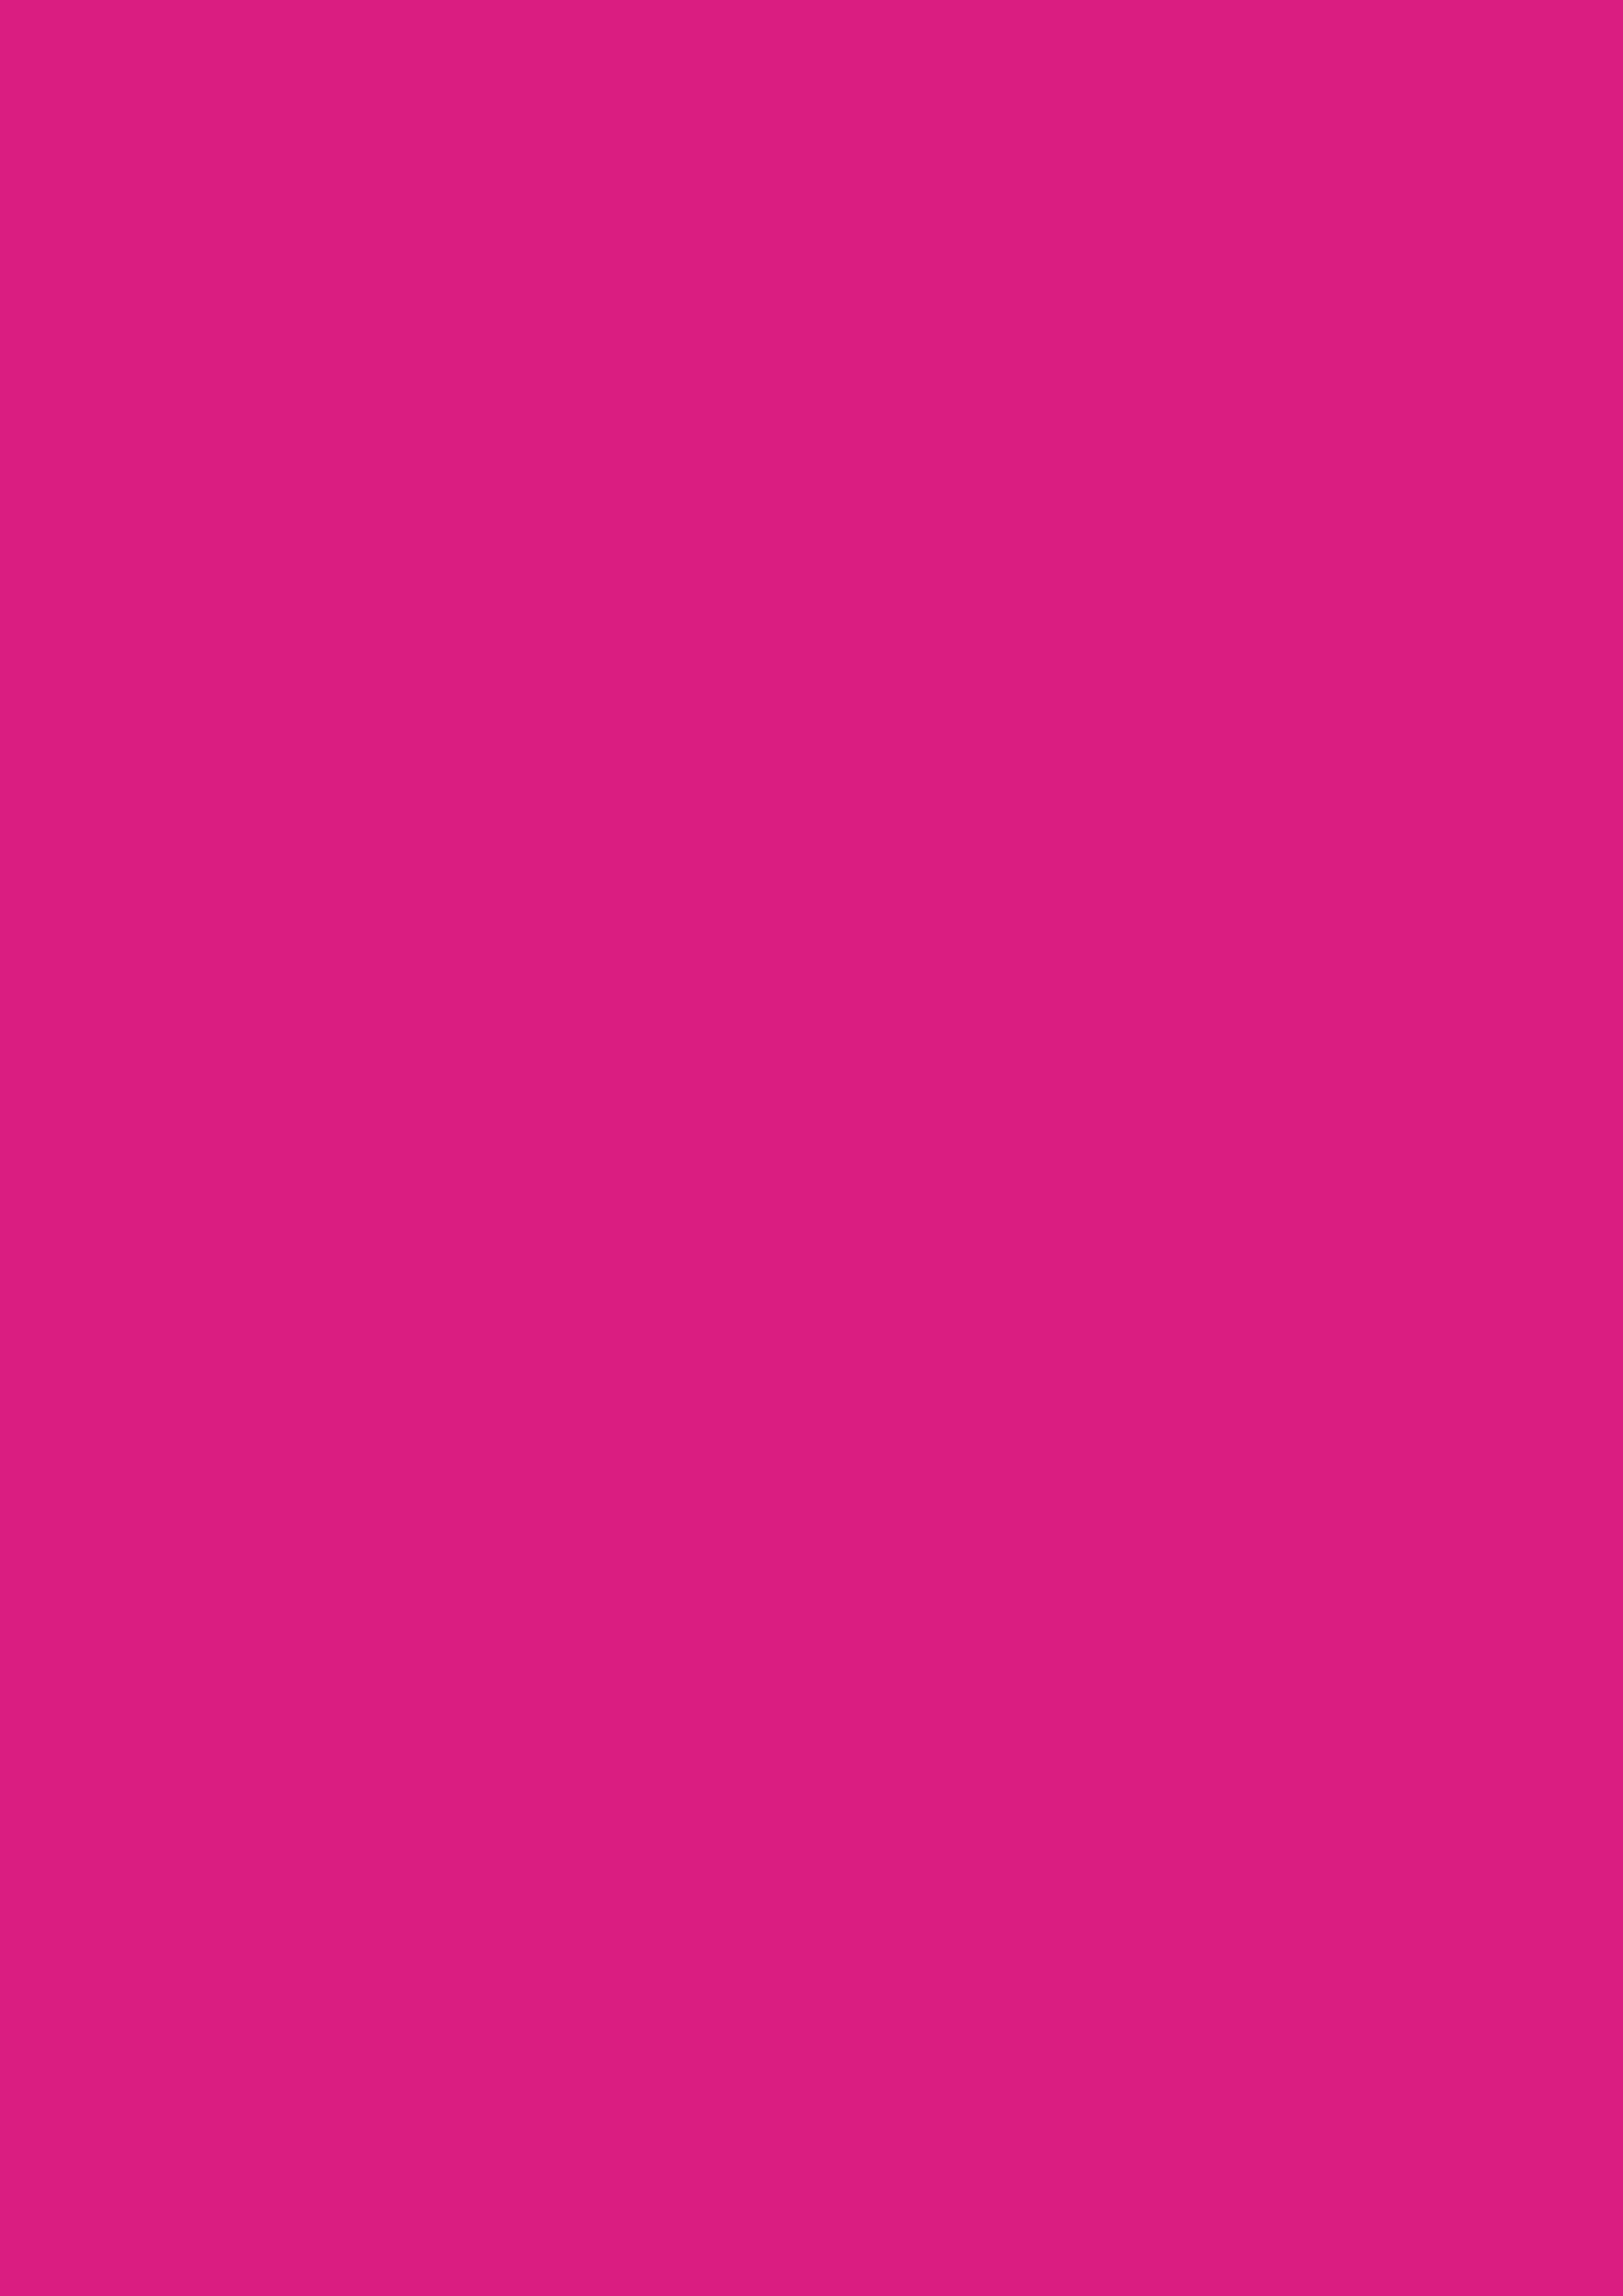 2480x3508 Vivid Cerise Solid Color Background